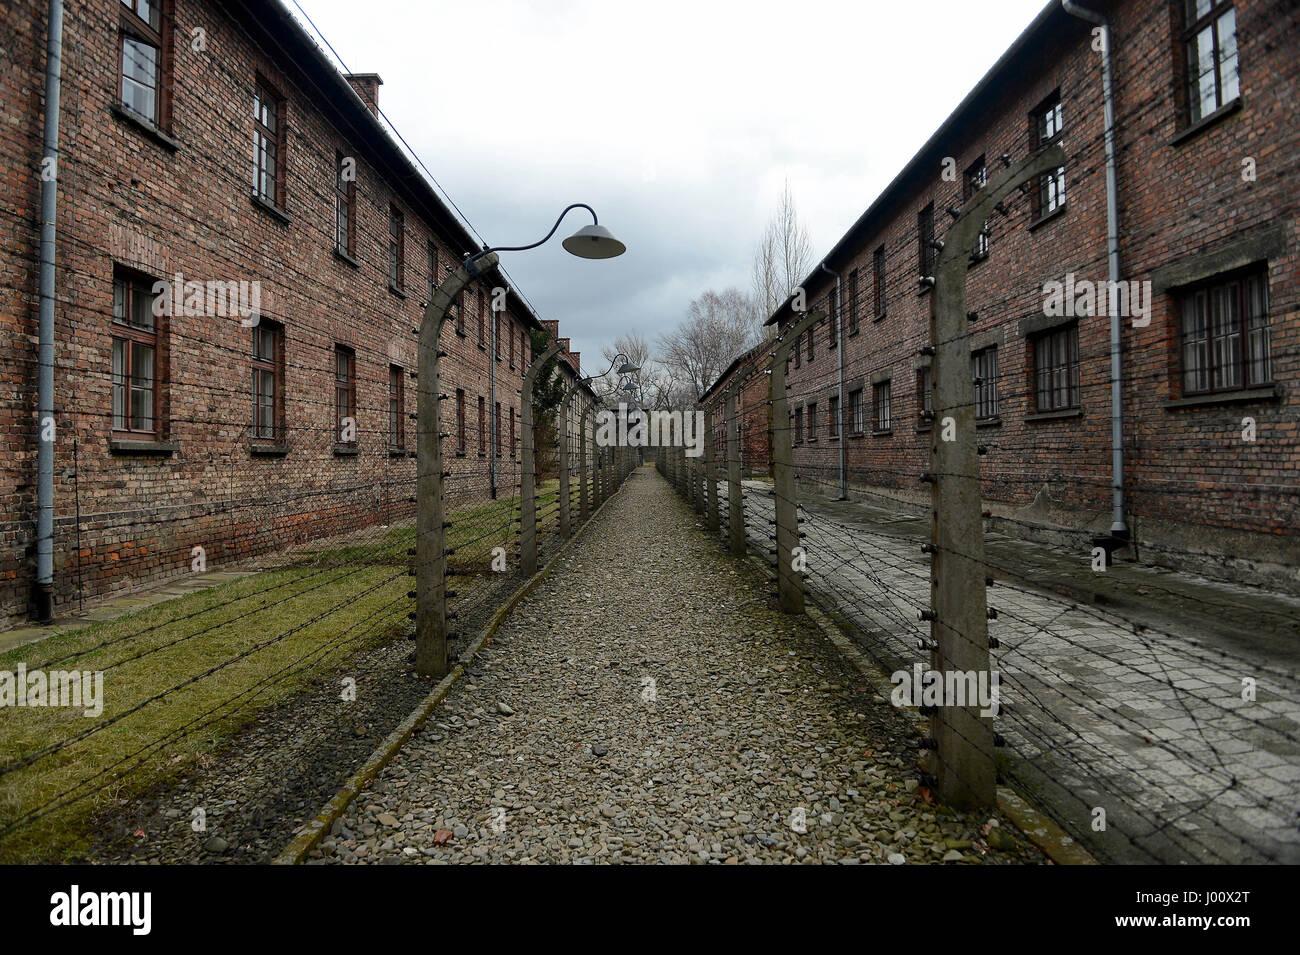 Oswiecim, Polen. 20. März 2017. 20170320 - ein Kies-Gang, flankiert durch Stacheldrahtzäune (einmal elektrifiziert) Stockbild